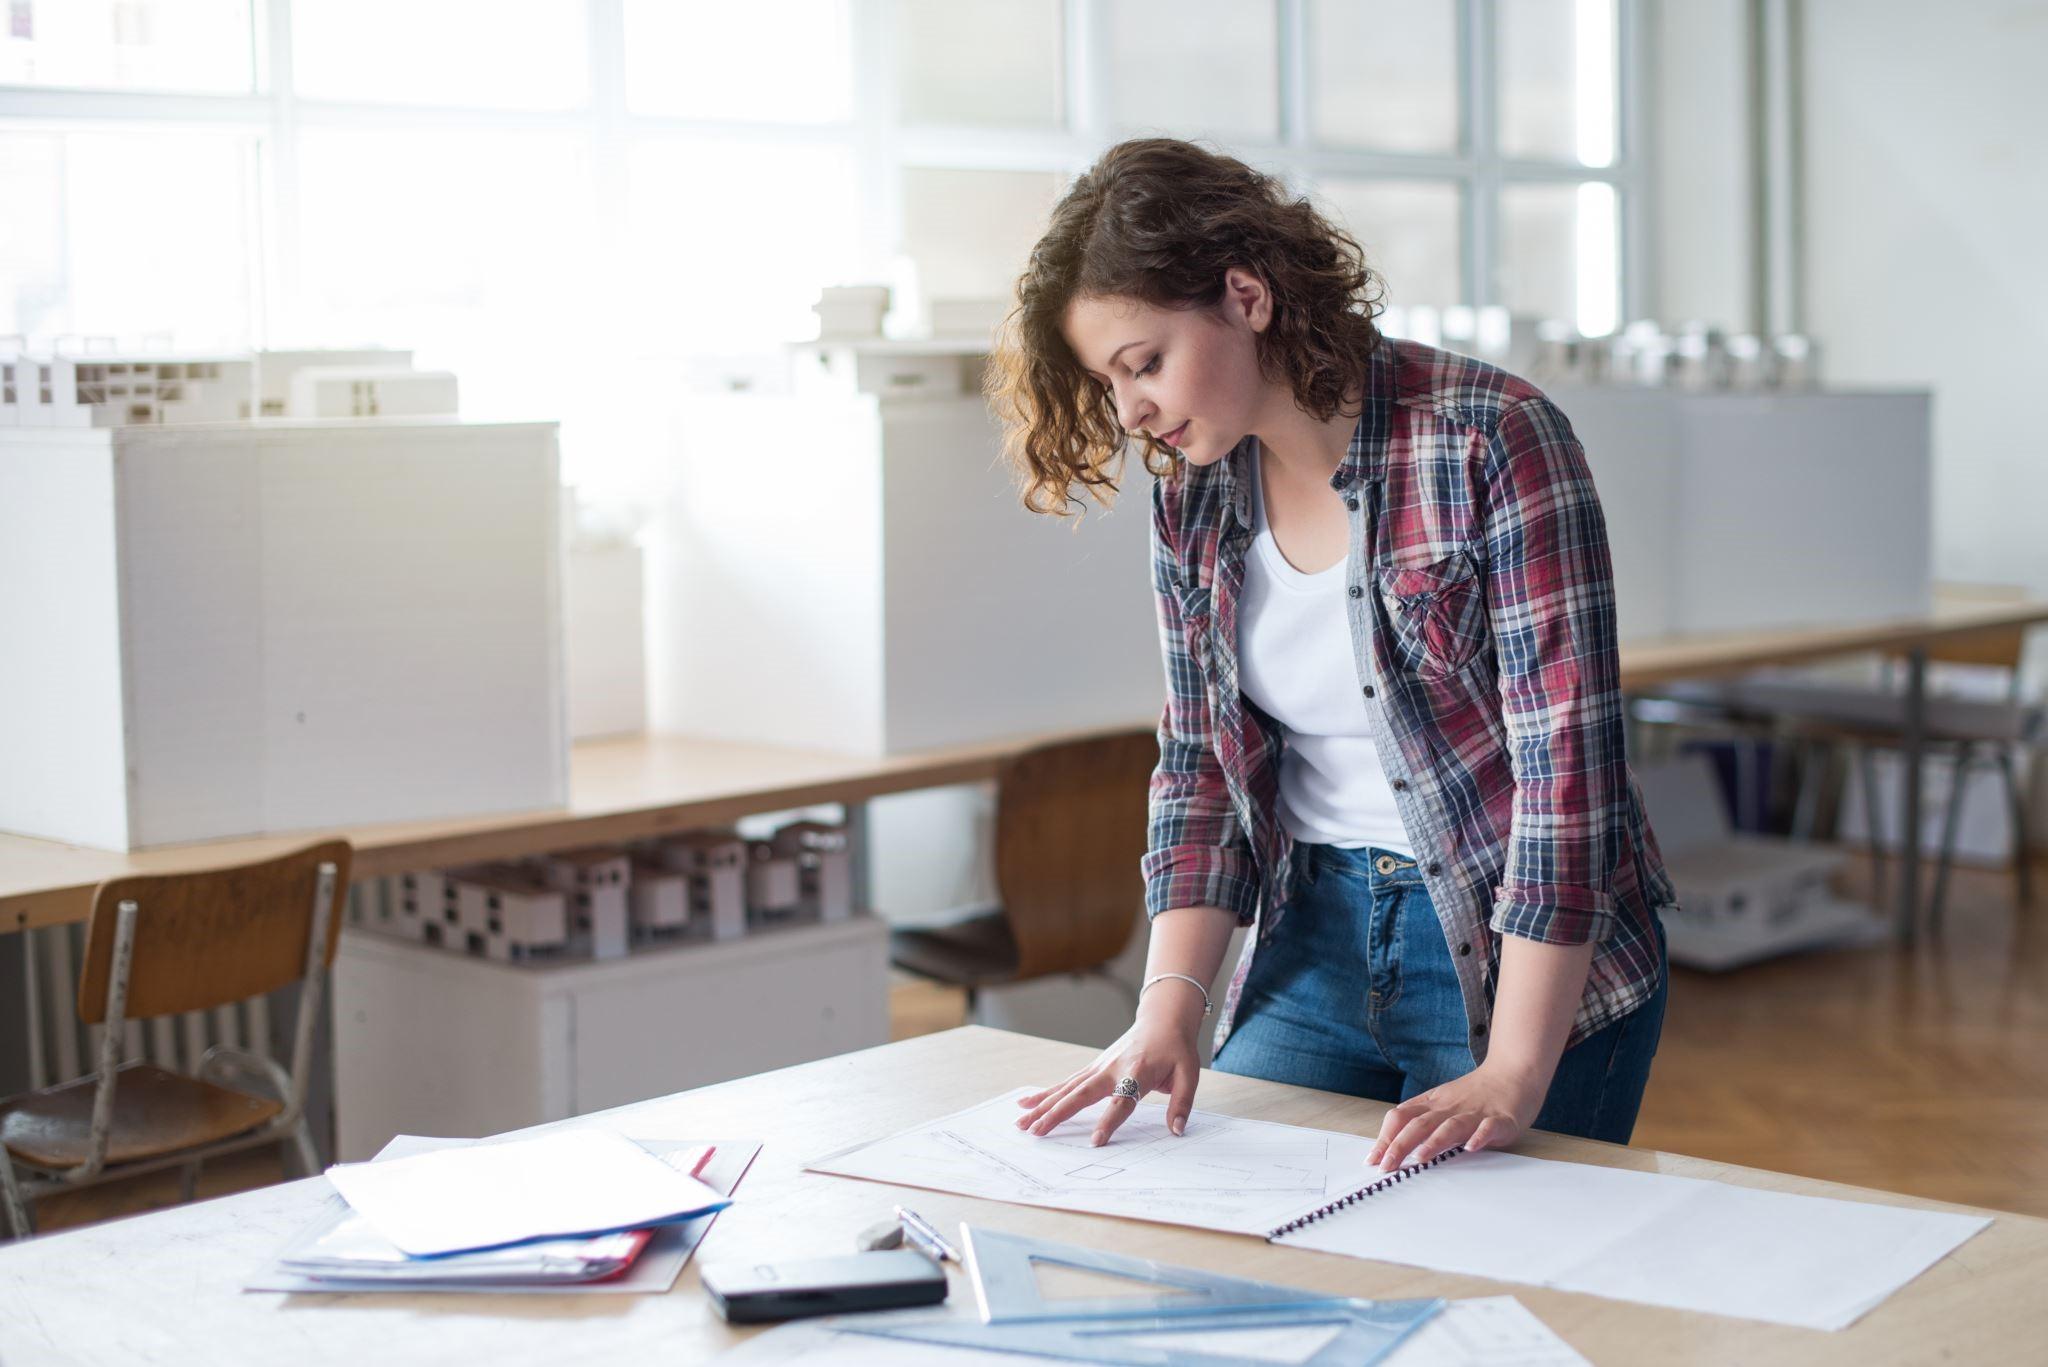 IKEA Kitchen Designer Consultation, IKEA Kitchen Design ideas